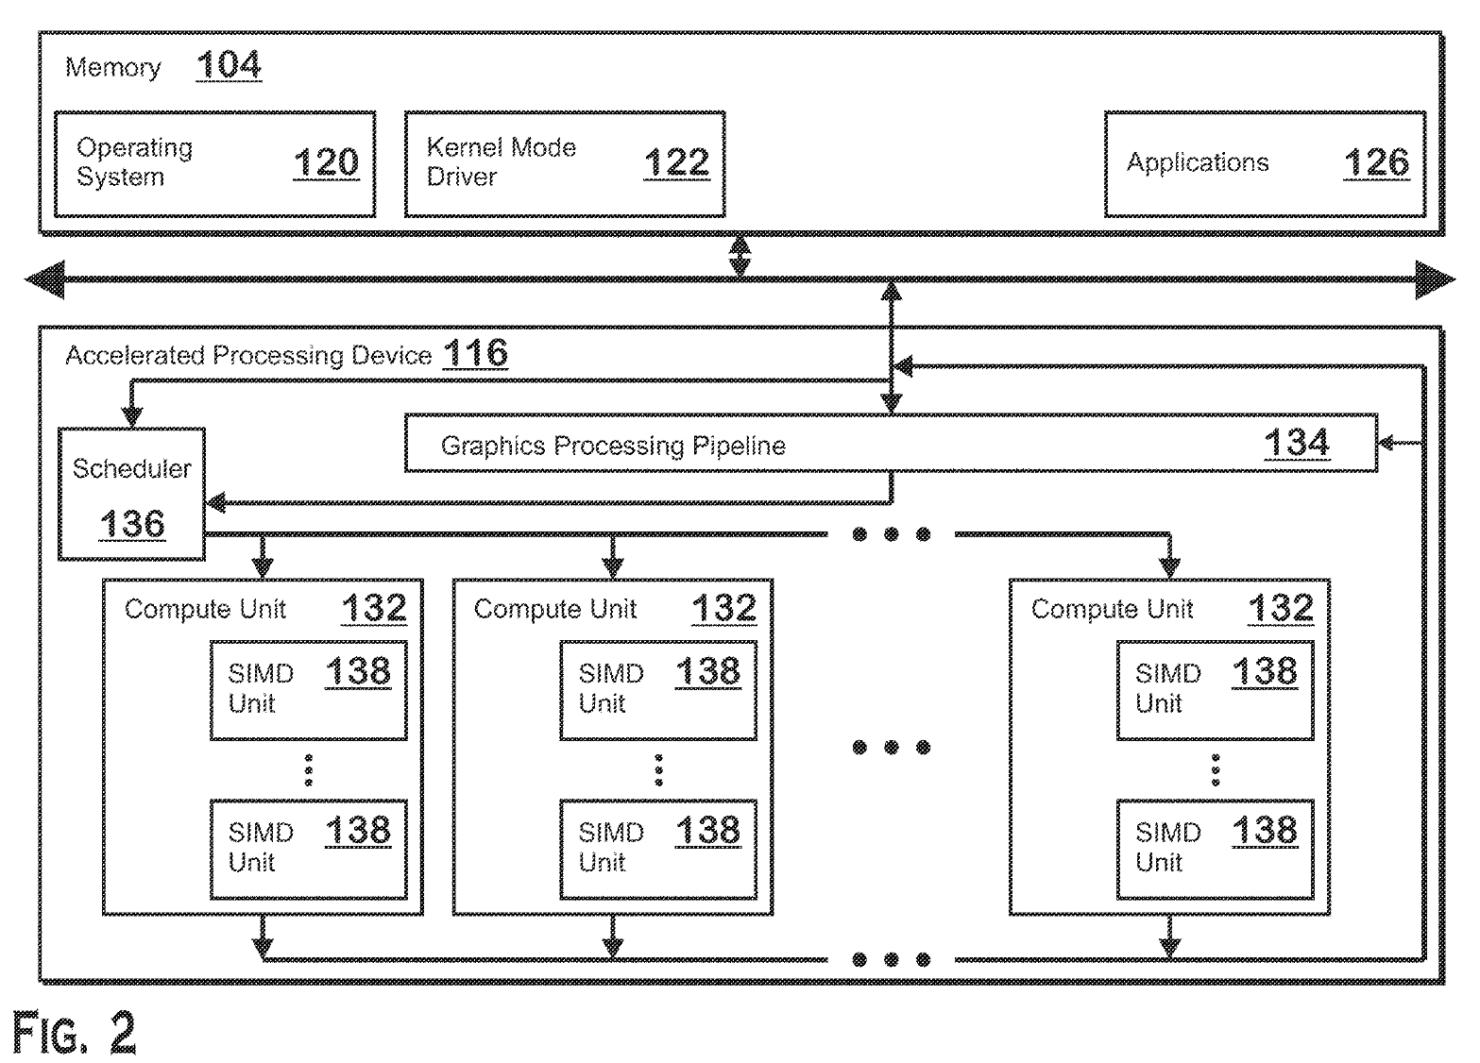 amd-next-gen-ryzen-cpu-apu-hybrid-architecture-with-big-and-little-processor-cores-_2